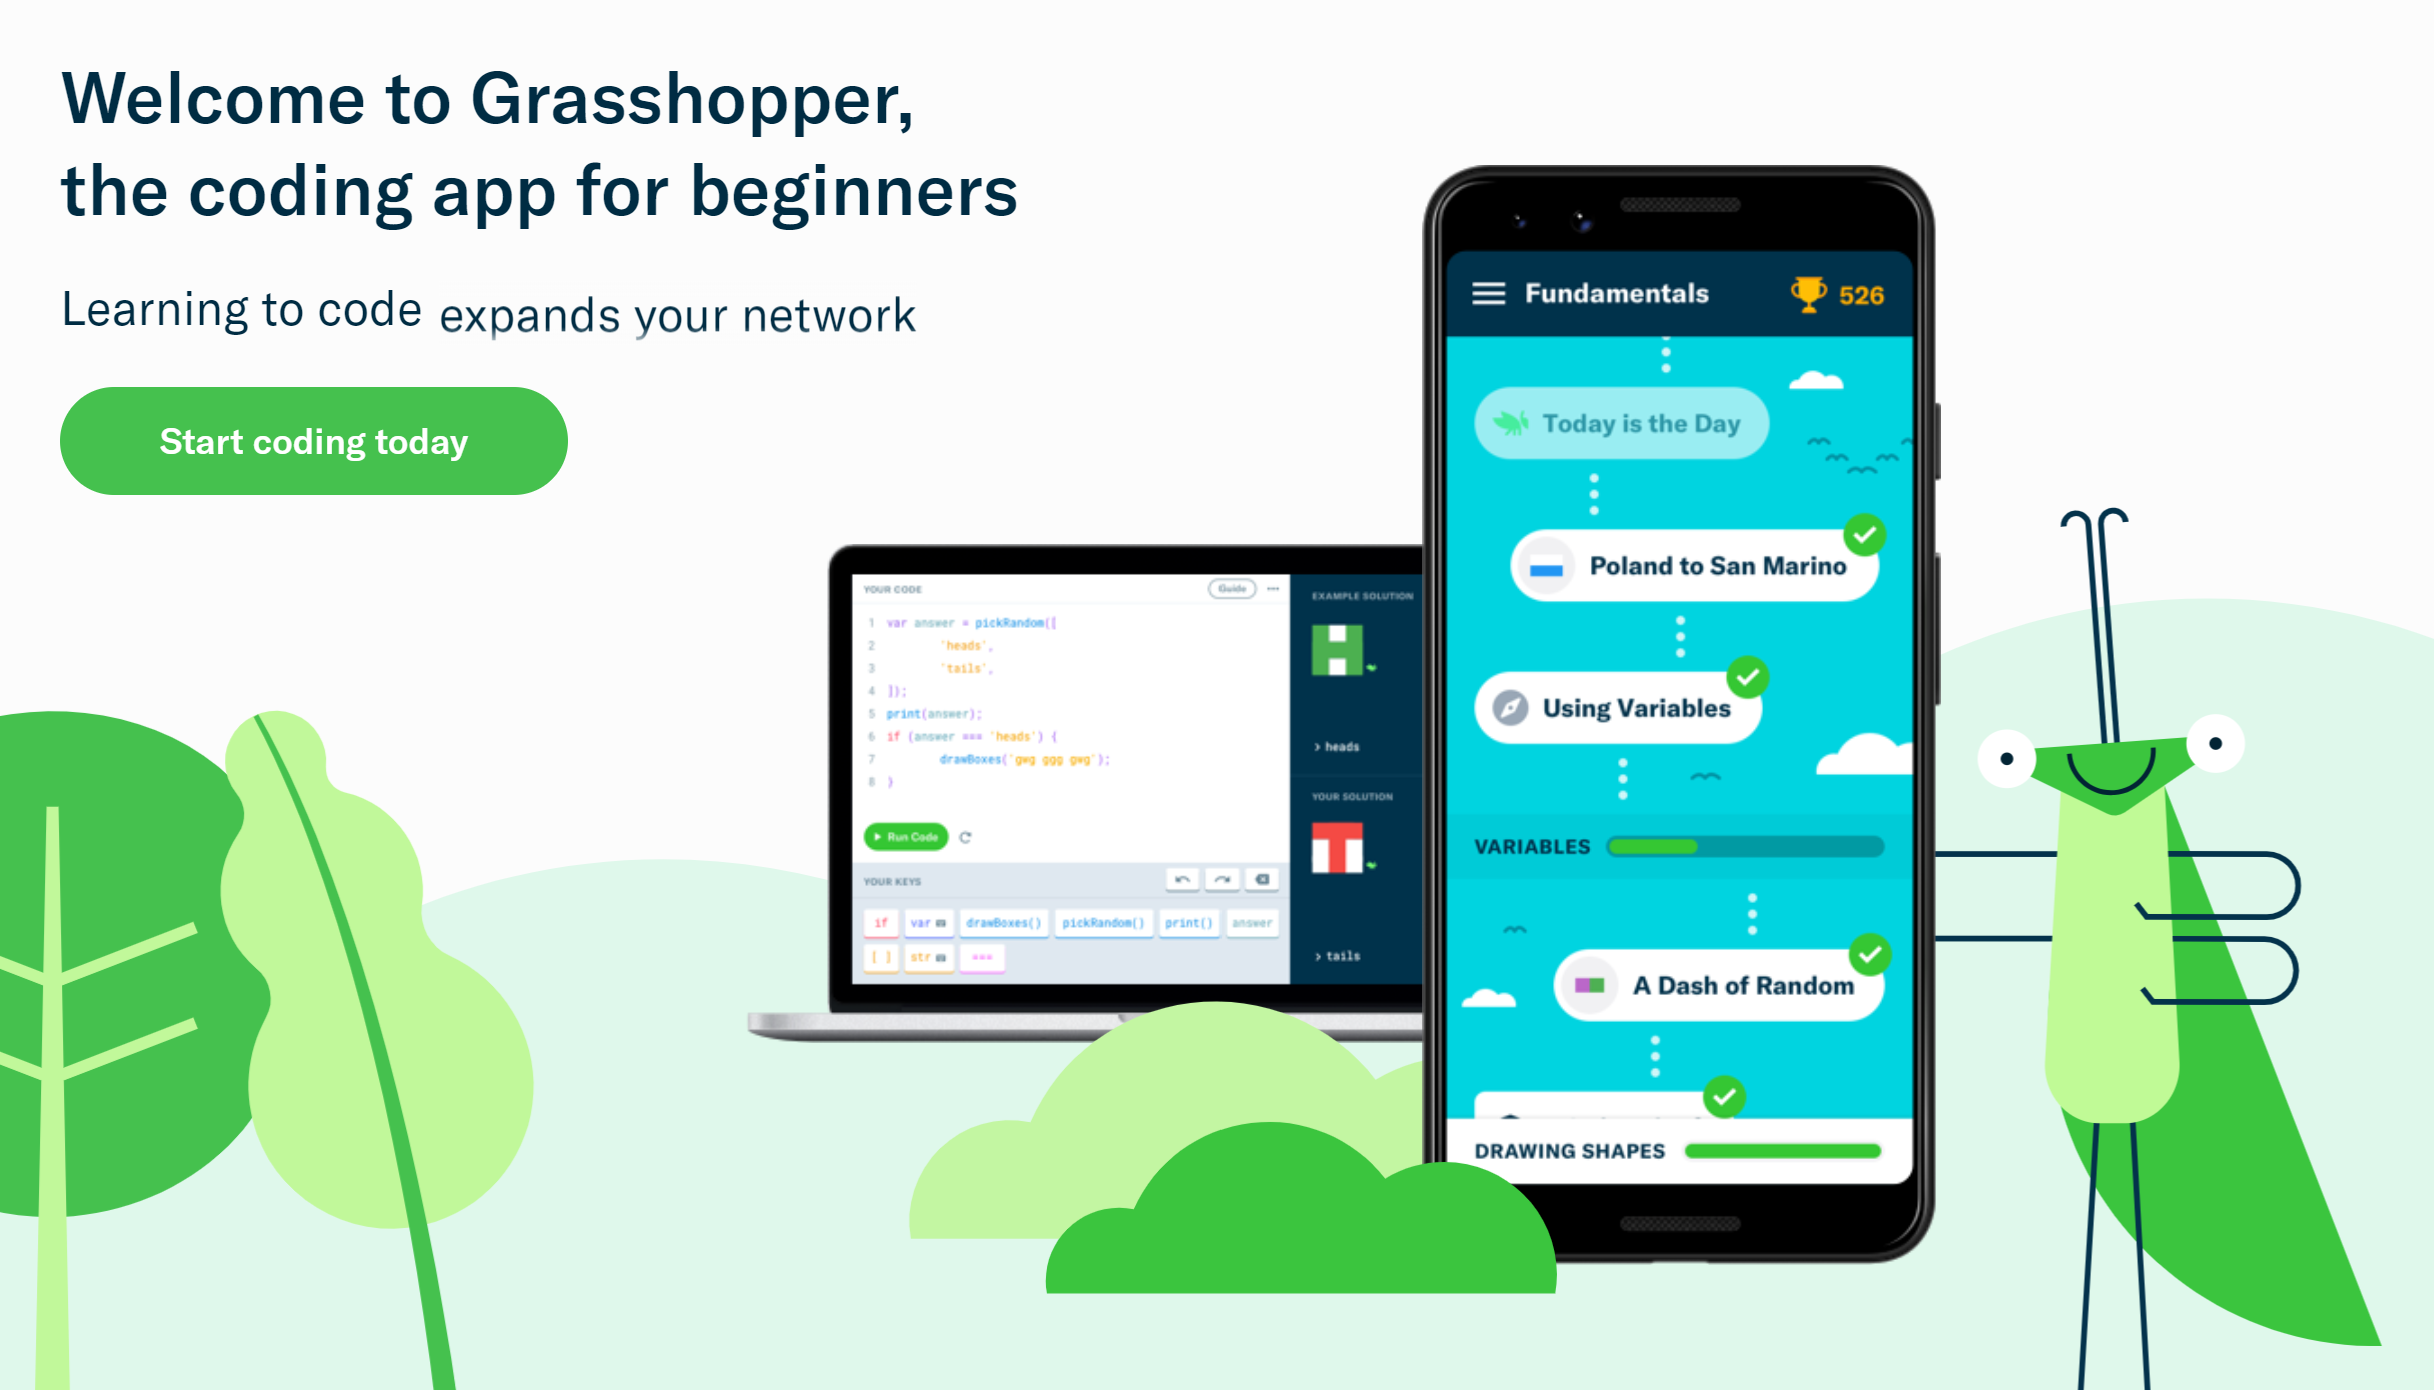 Grasshopper Coding App